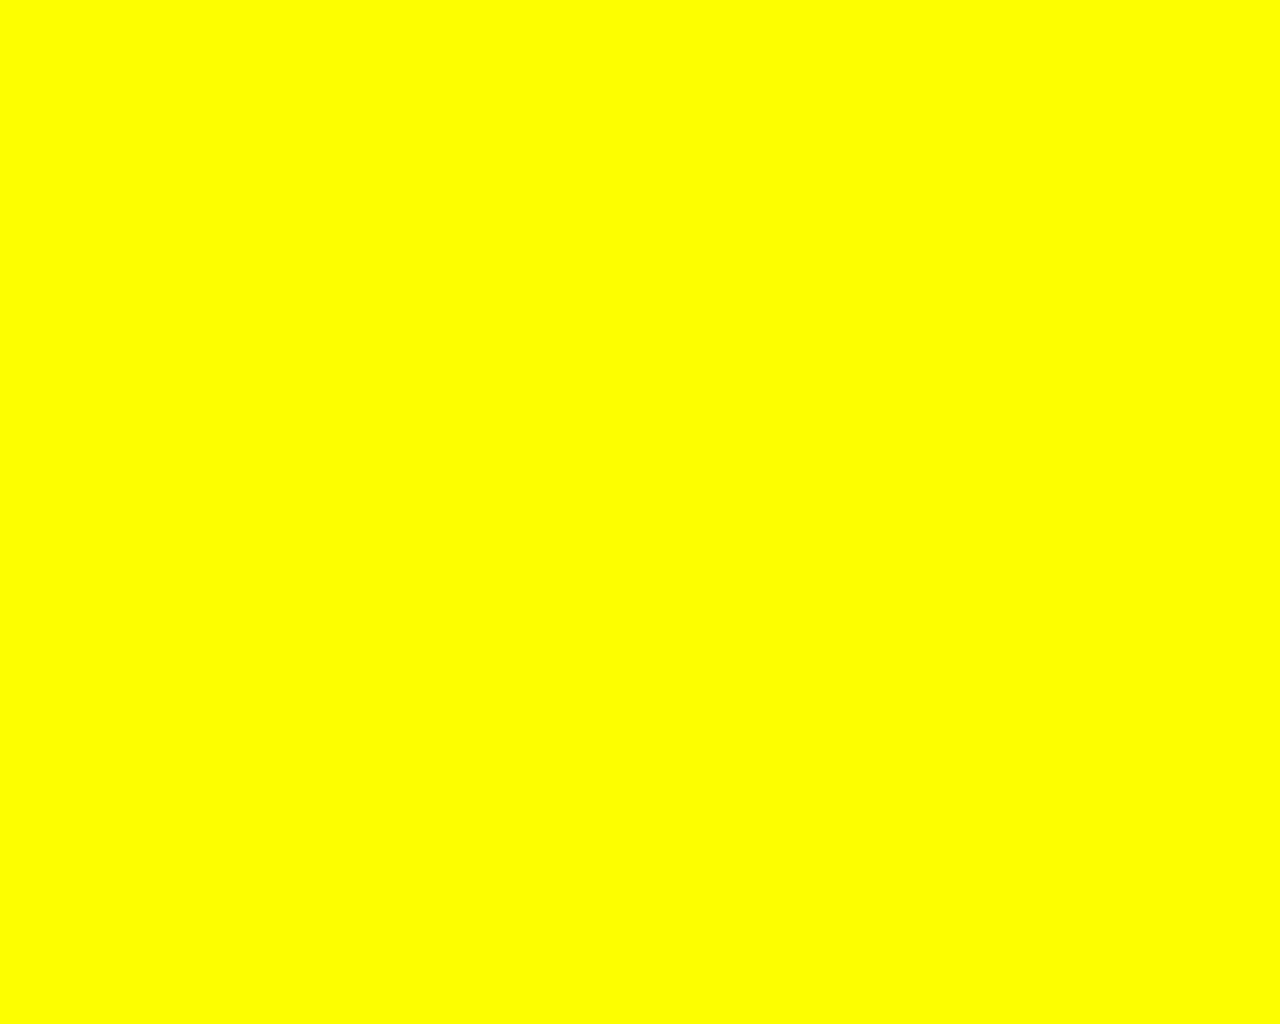 1280x1024 Lemon Glacier Solid Color Background